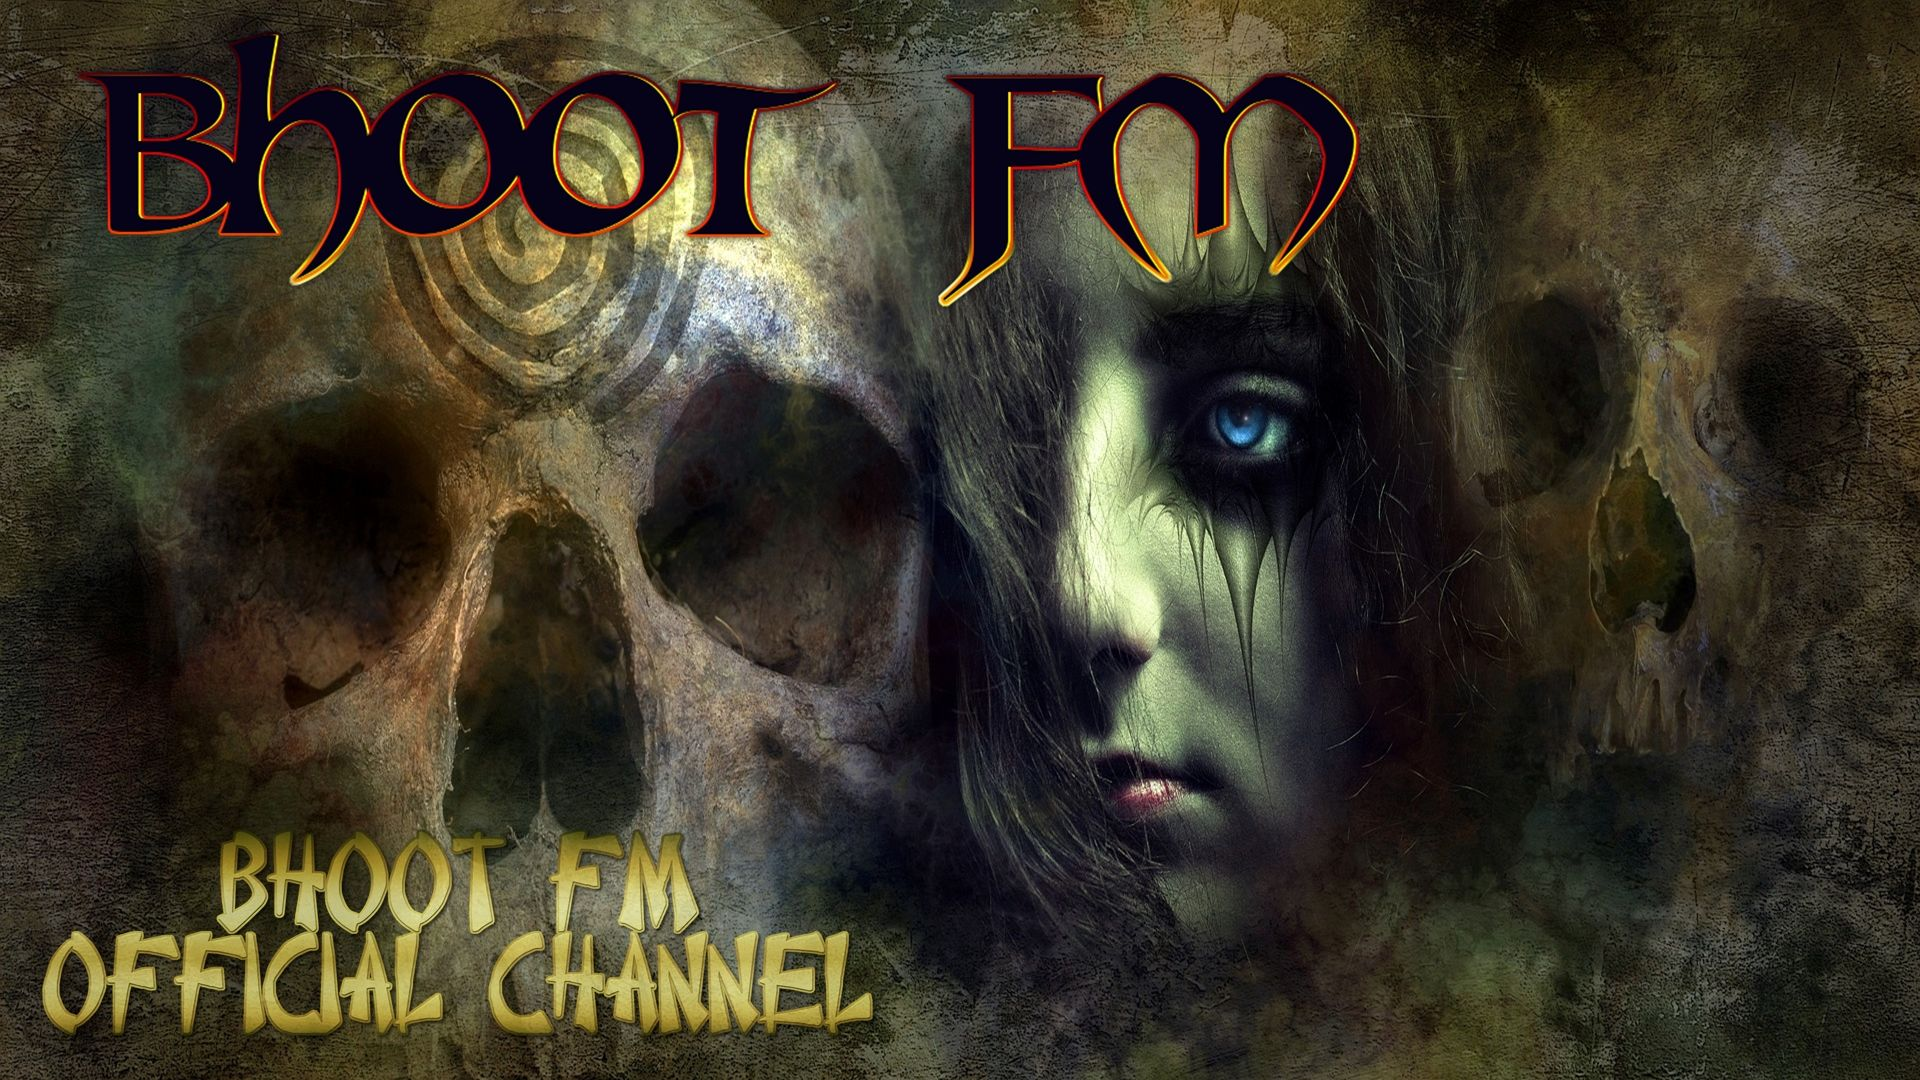 💐 Bhoot fm download 26 october 2018 | Bhoot FM 26 October